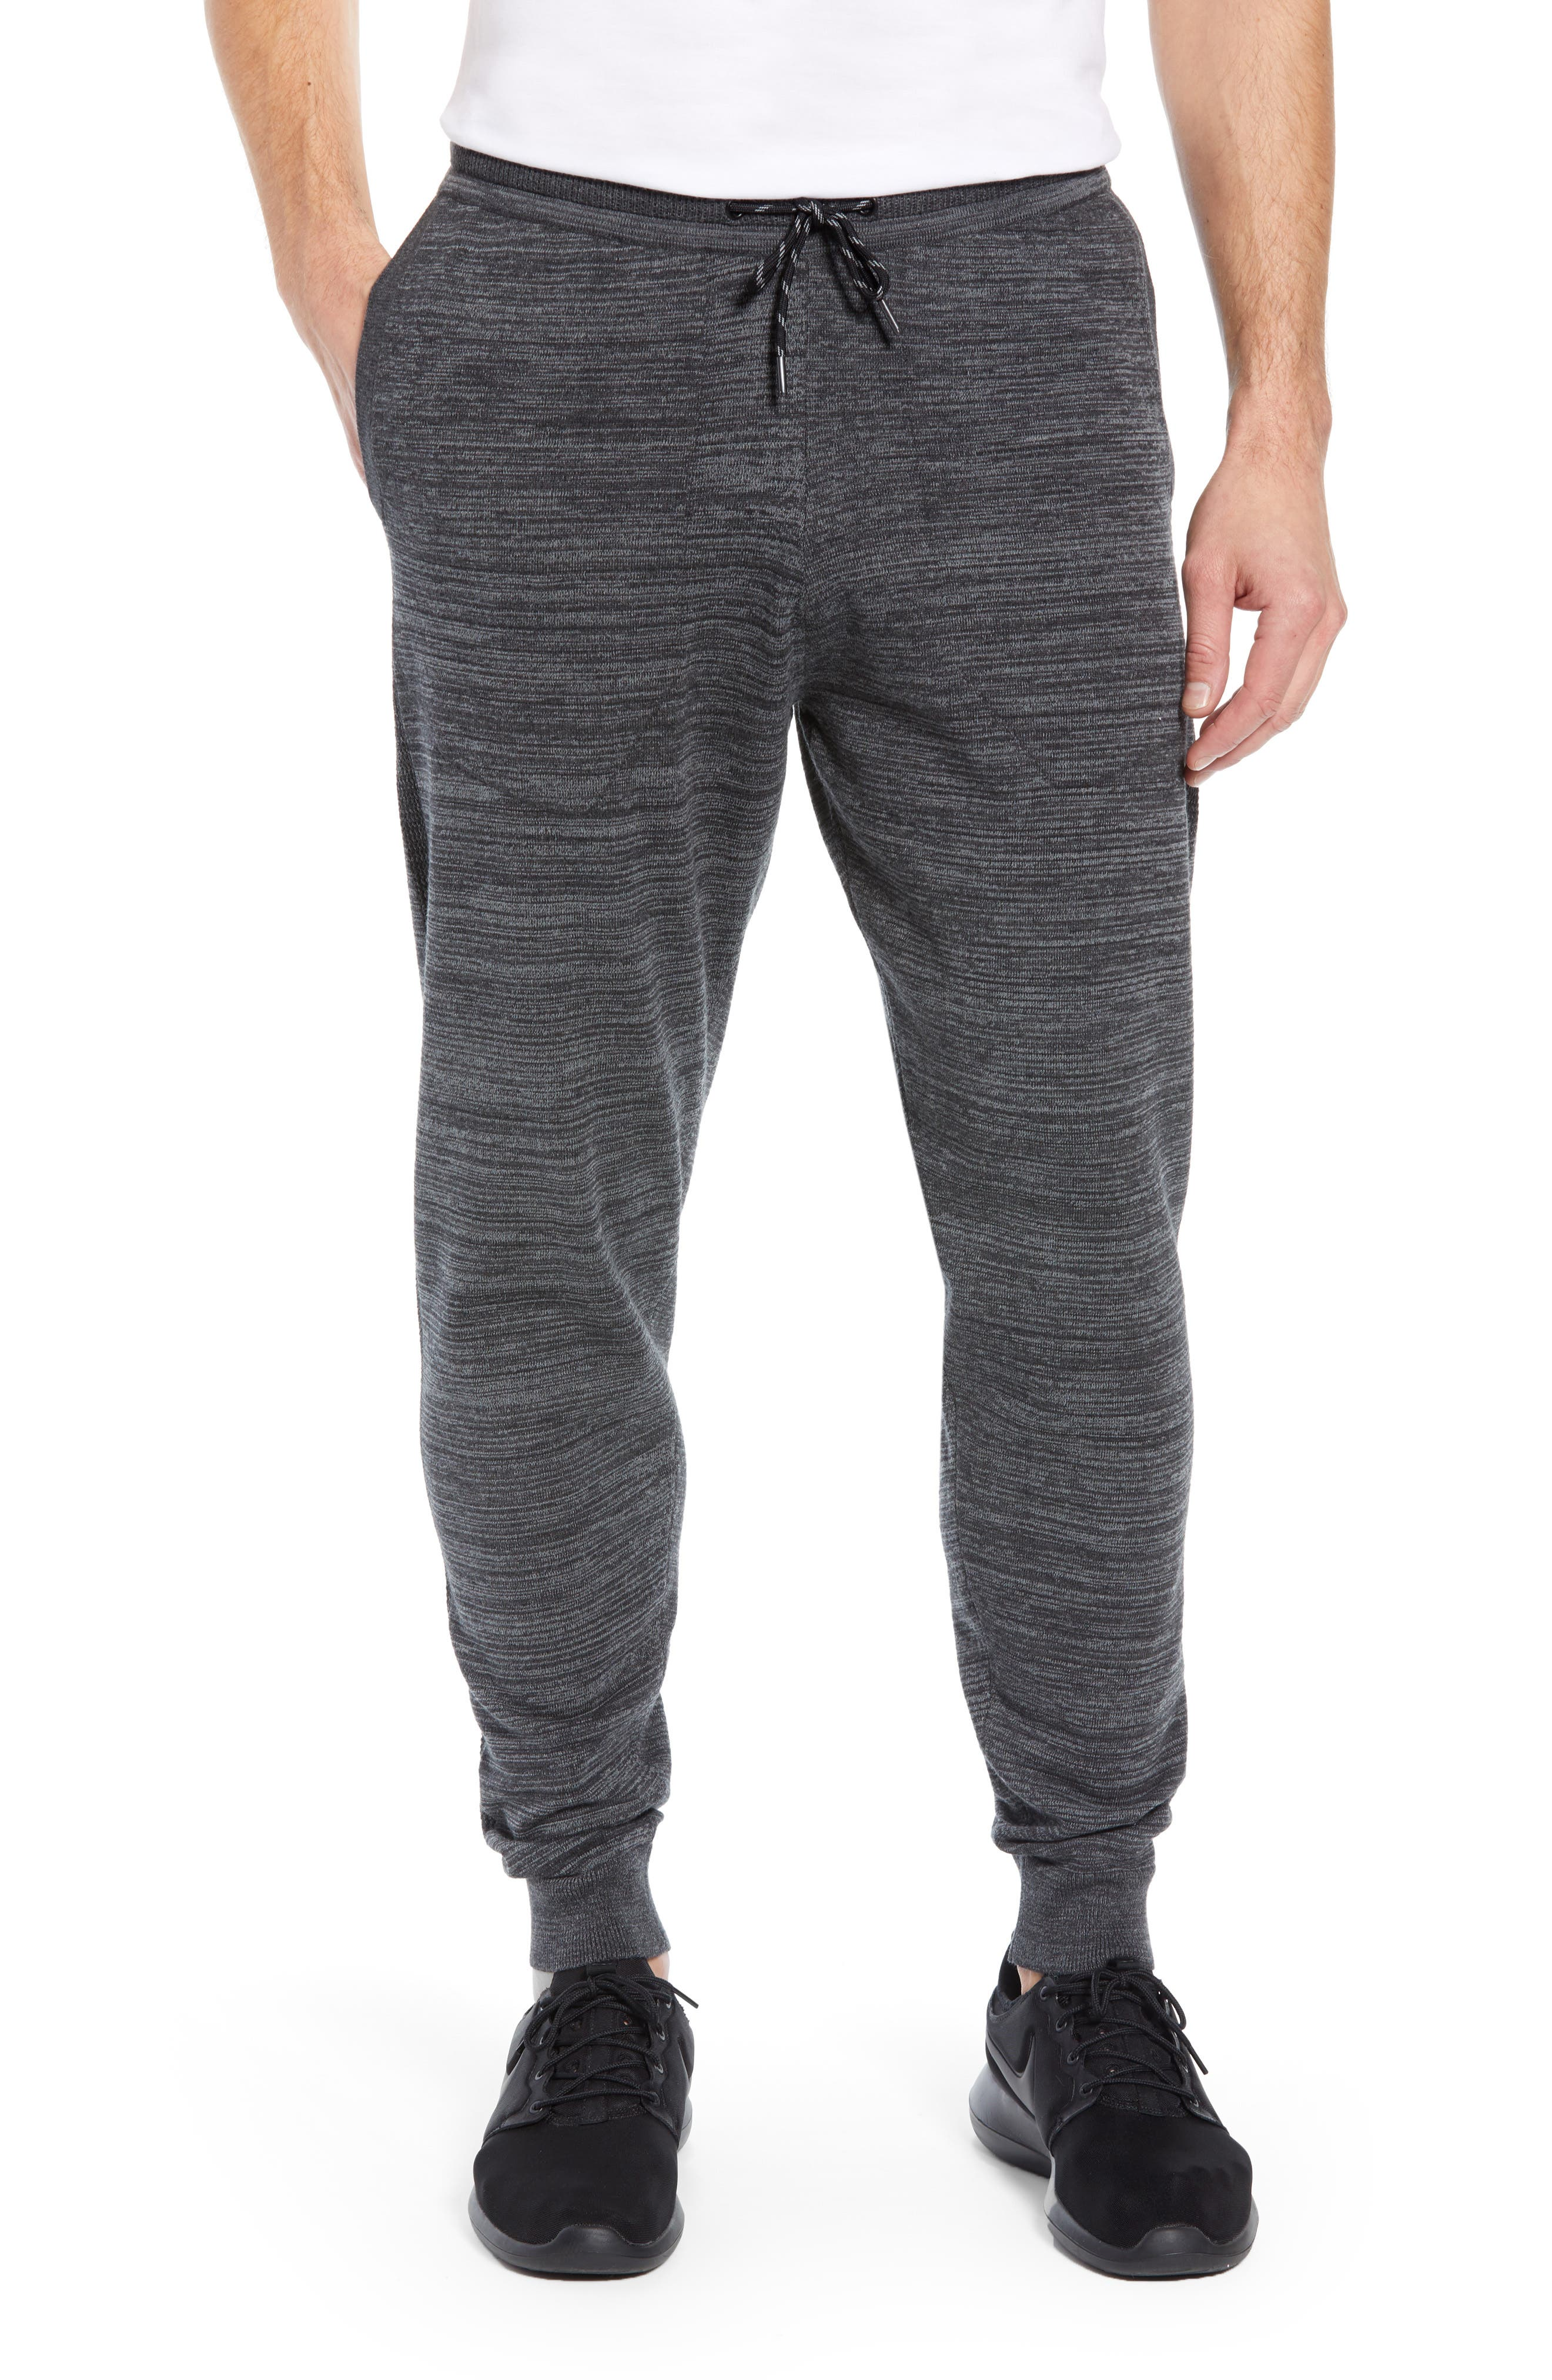 Tech Sweater Knit Jogger Pants,                         Main,                         color, BLACK OXIDE SPACEDYE